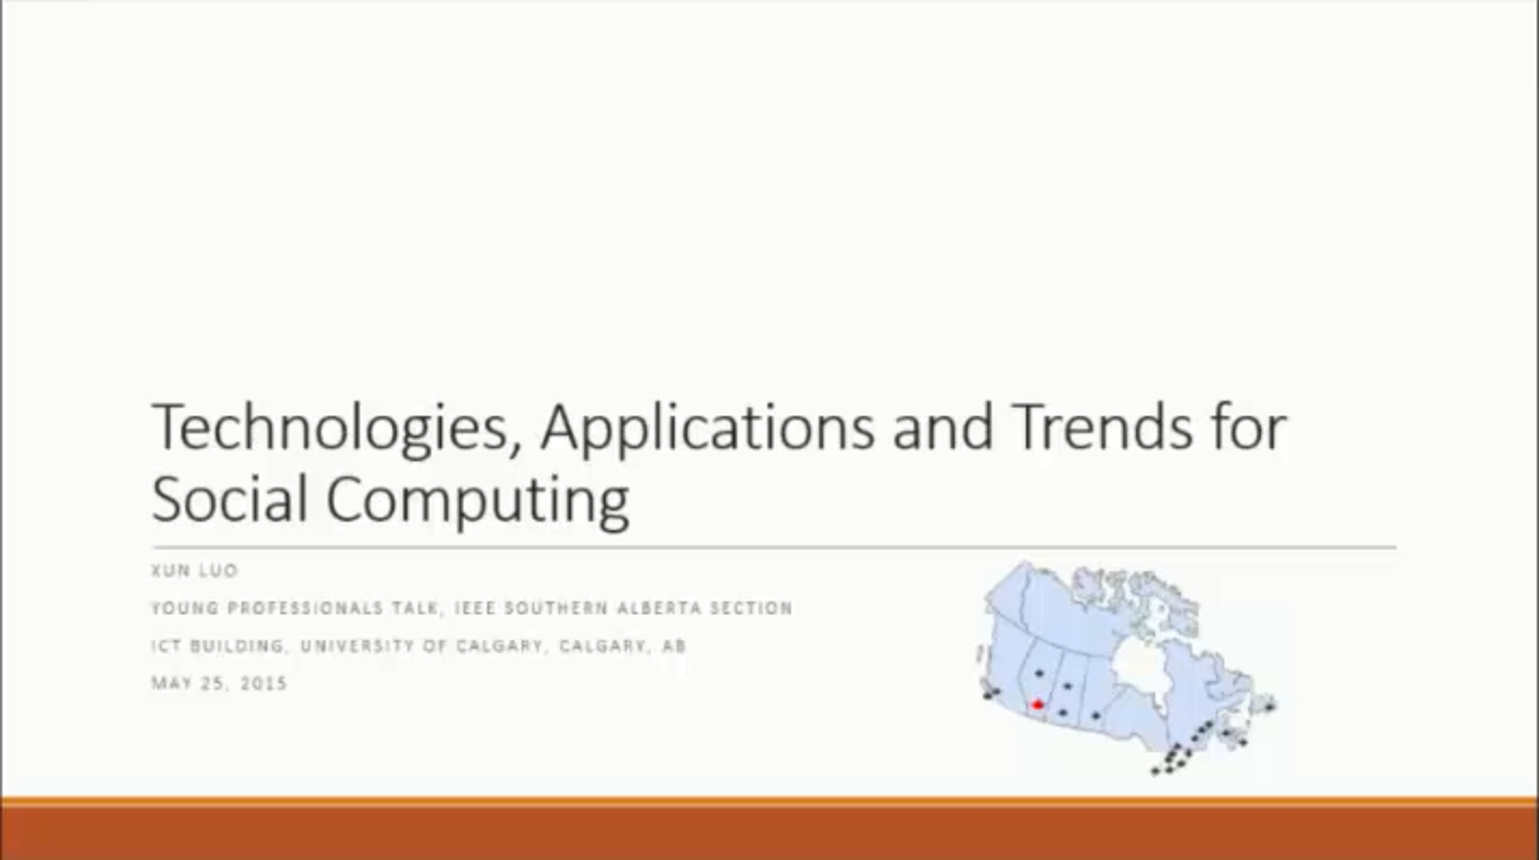 Xun Luo - University of Calgary Talk